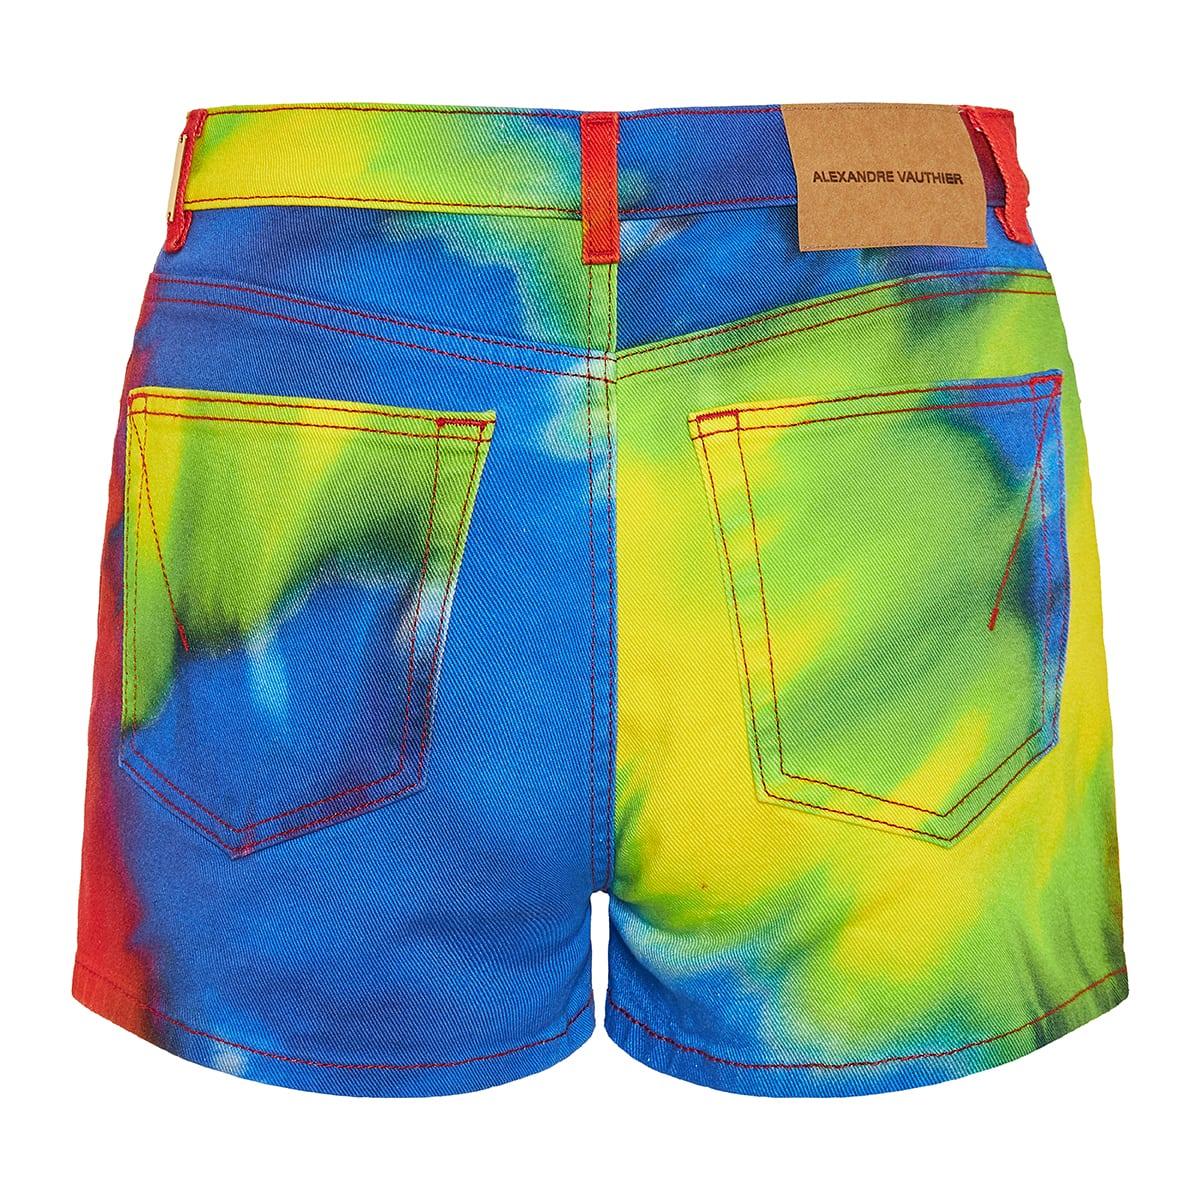 Tie-dye denim mini shorts